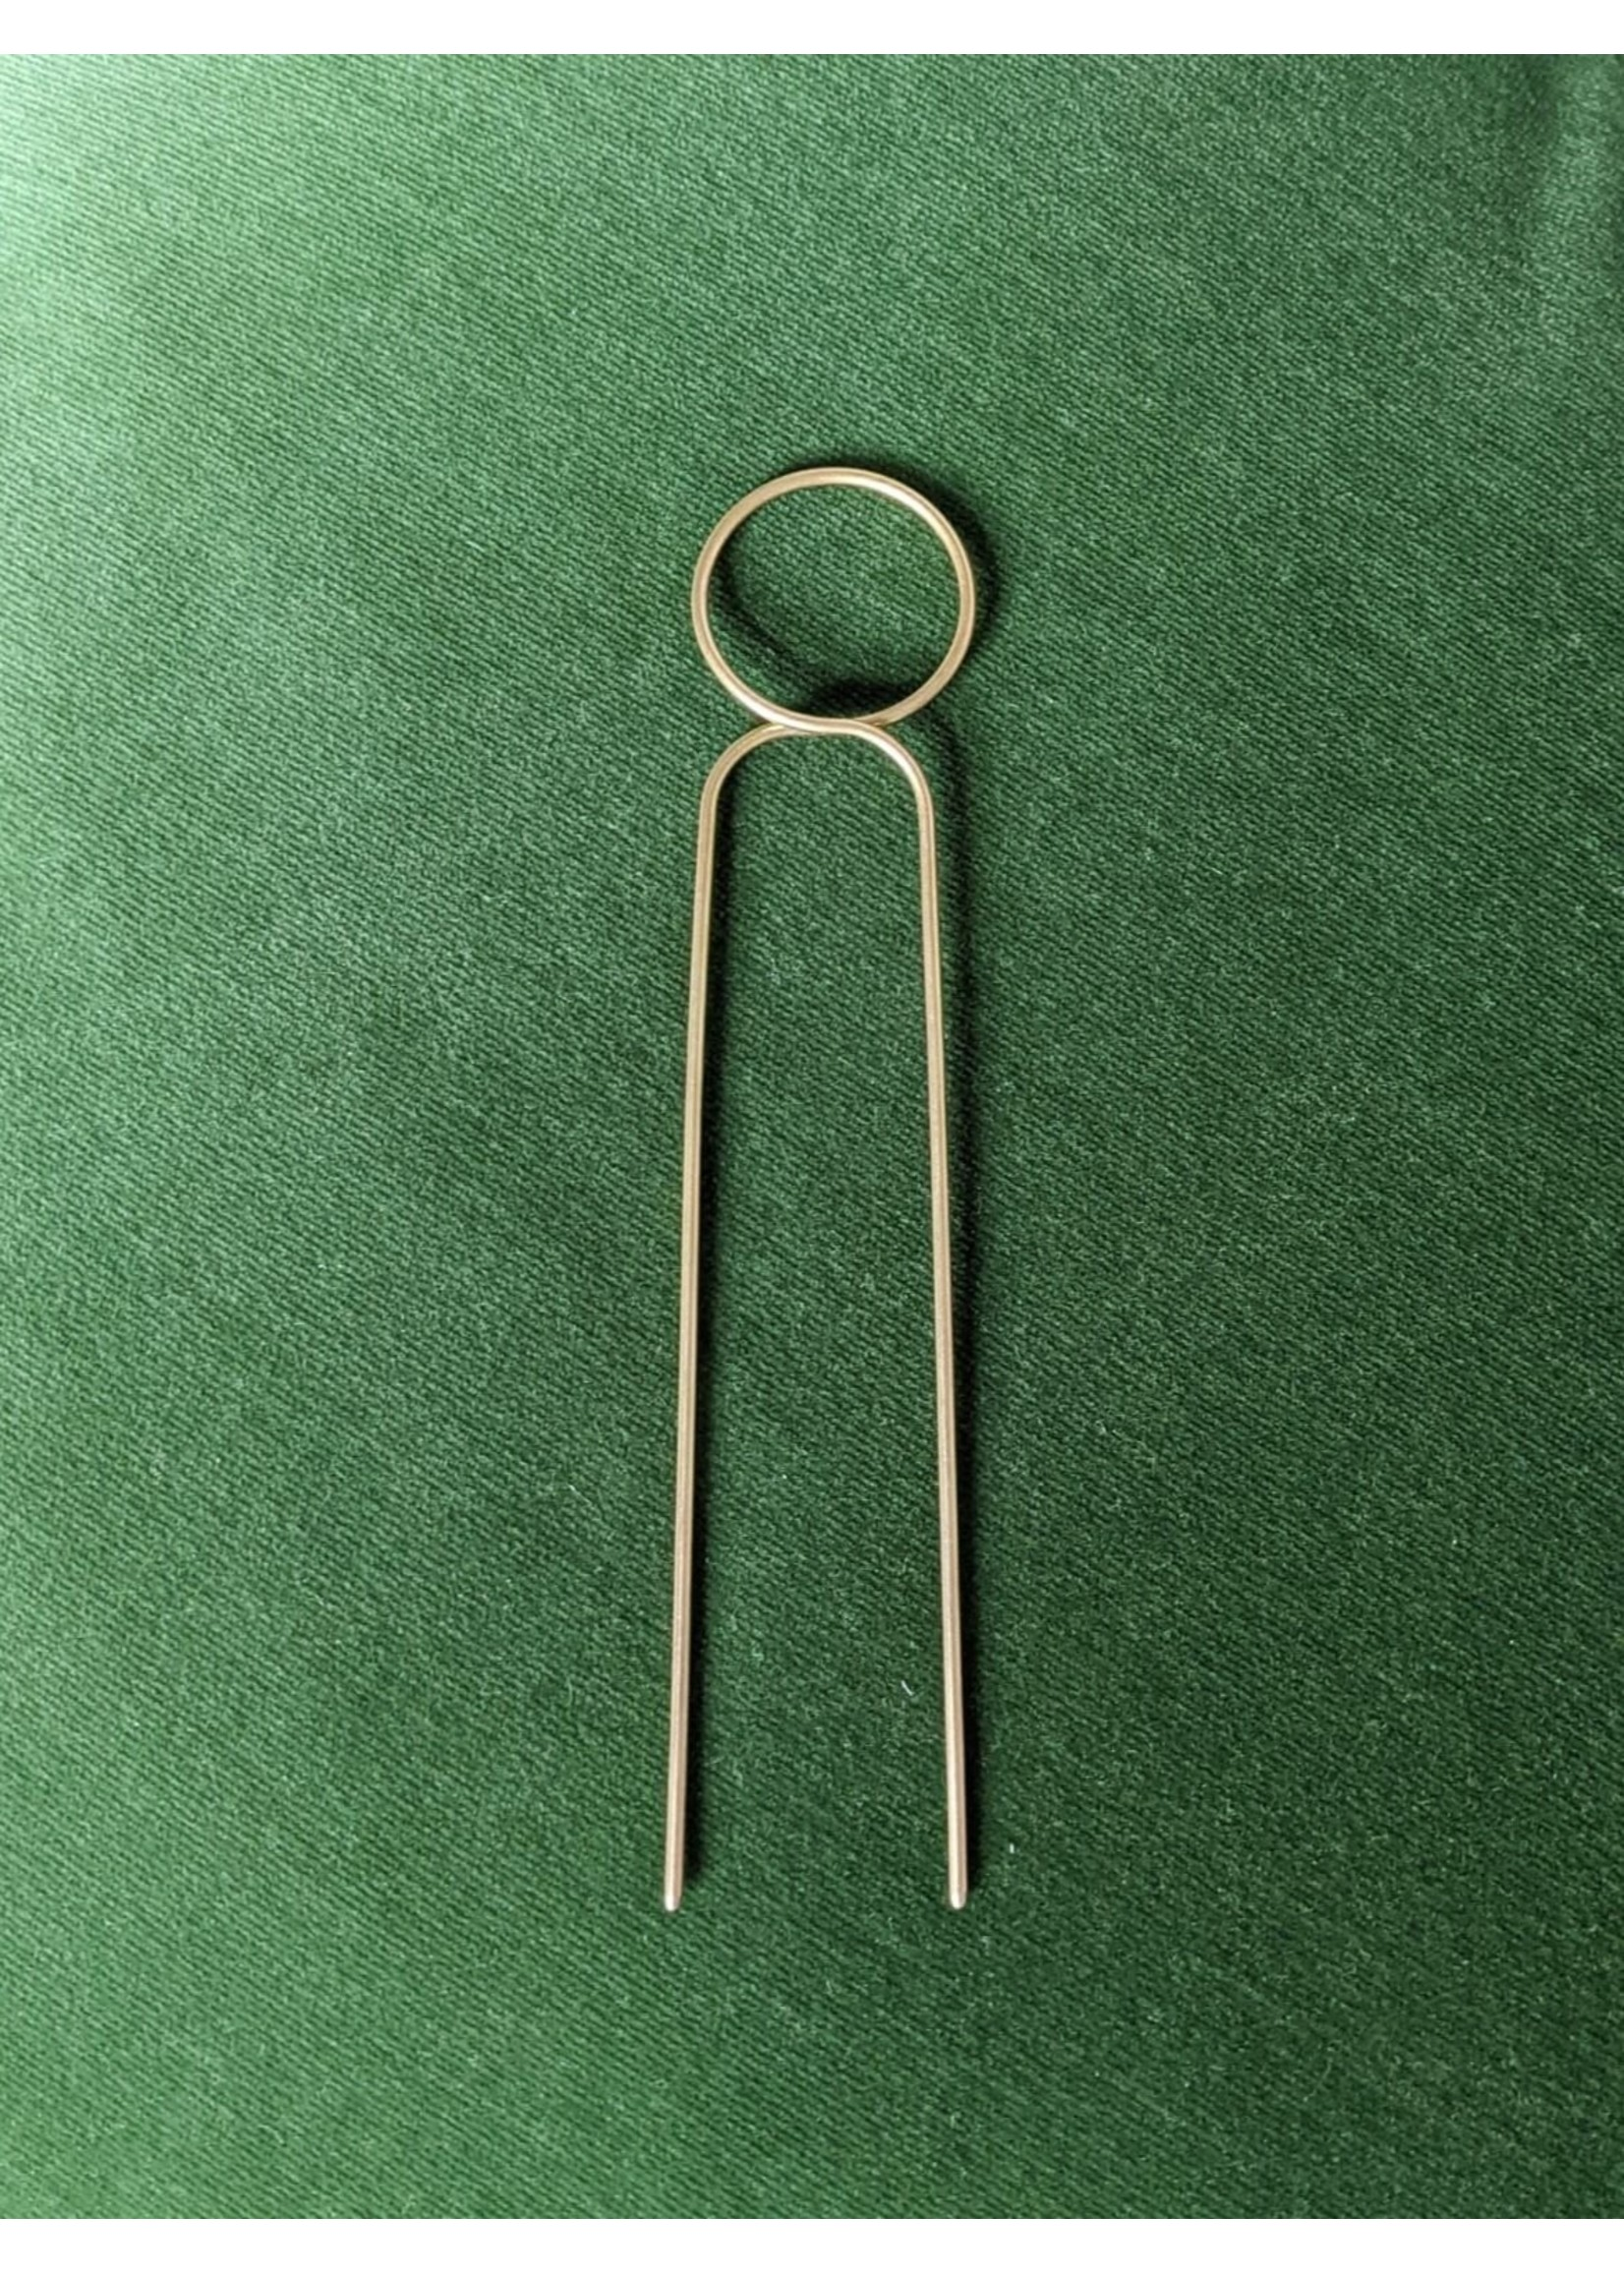 Roake Roake The 'Lizzy' Brass Hairpin - Loop